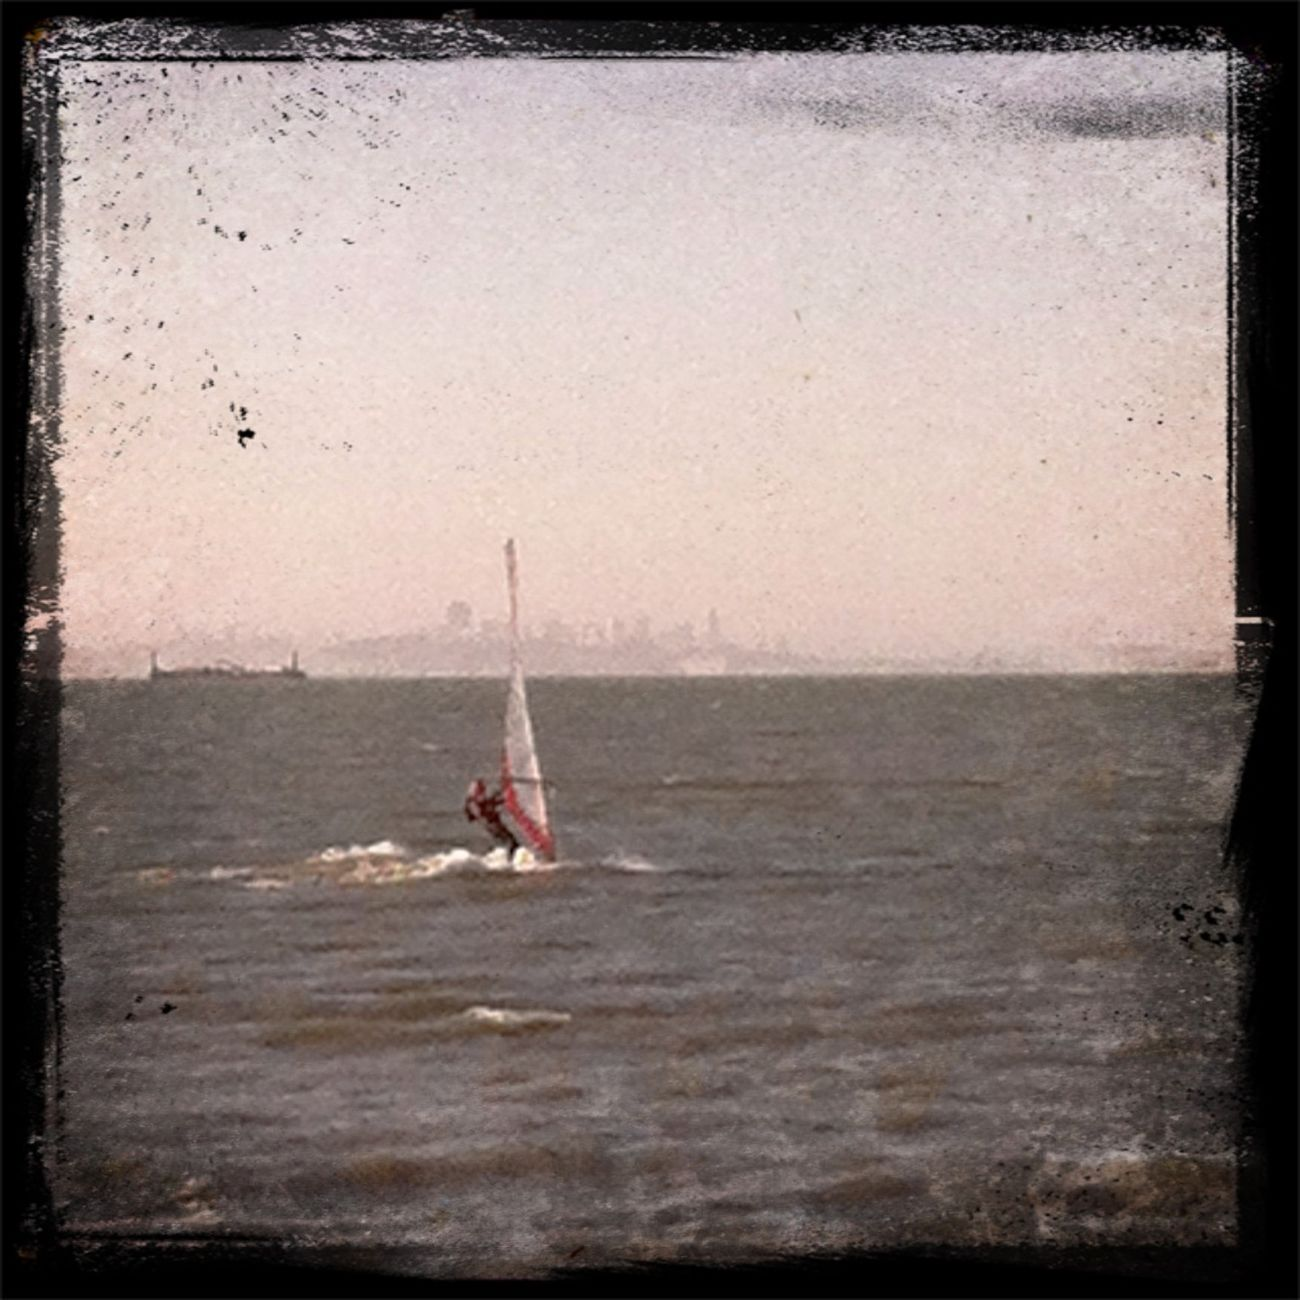 Bay Enjoying The Sun Windsurfing